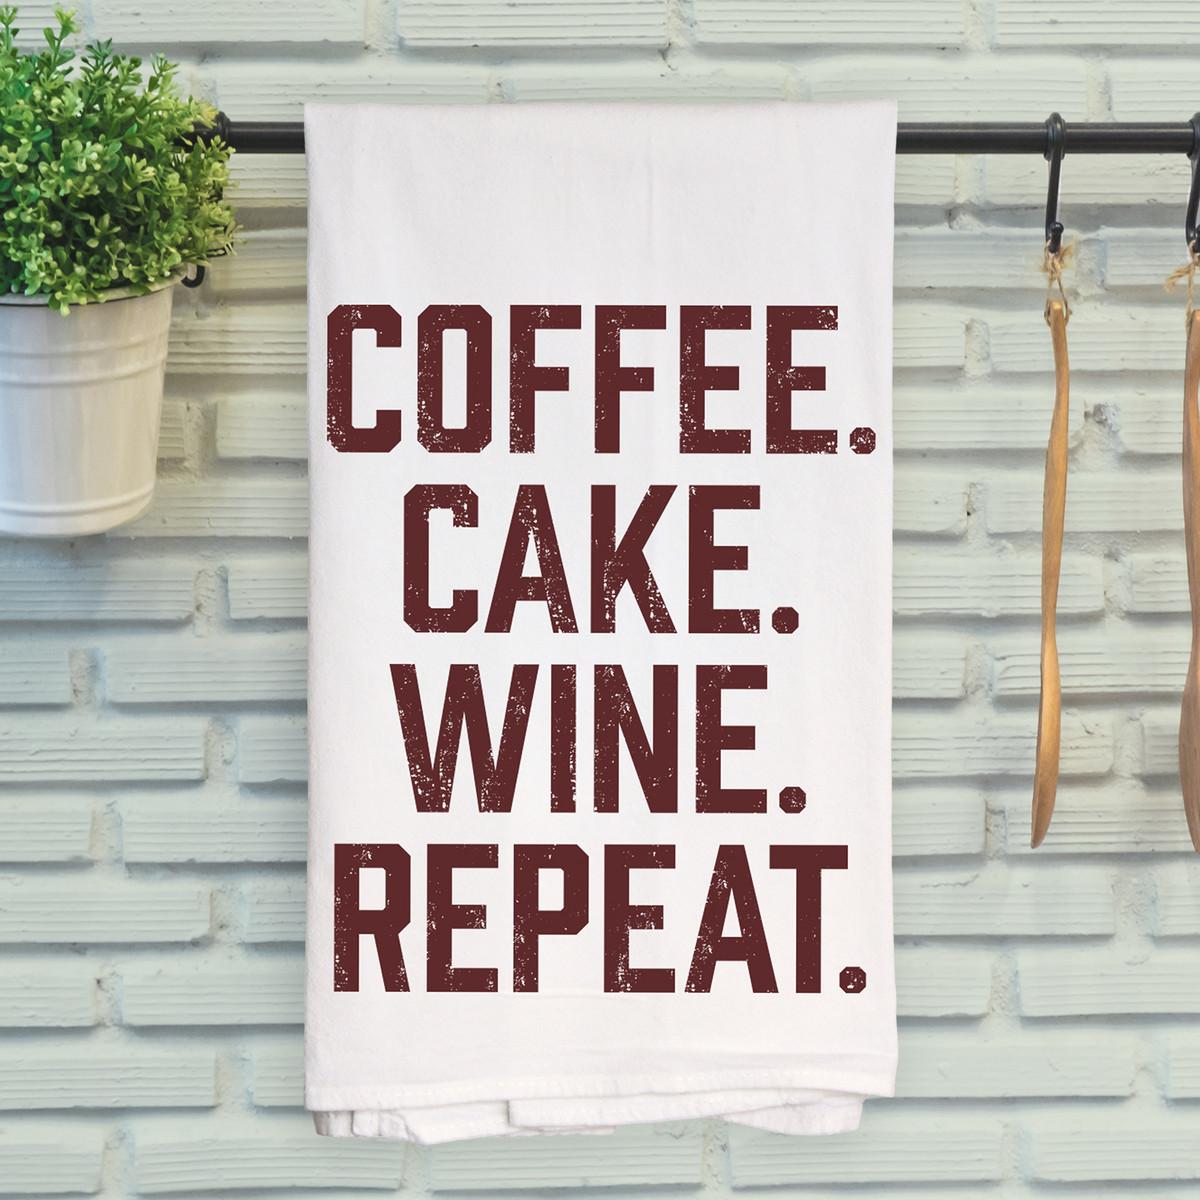 Coffee. Cake. Wine. Repeat.